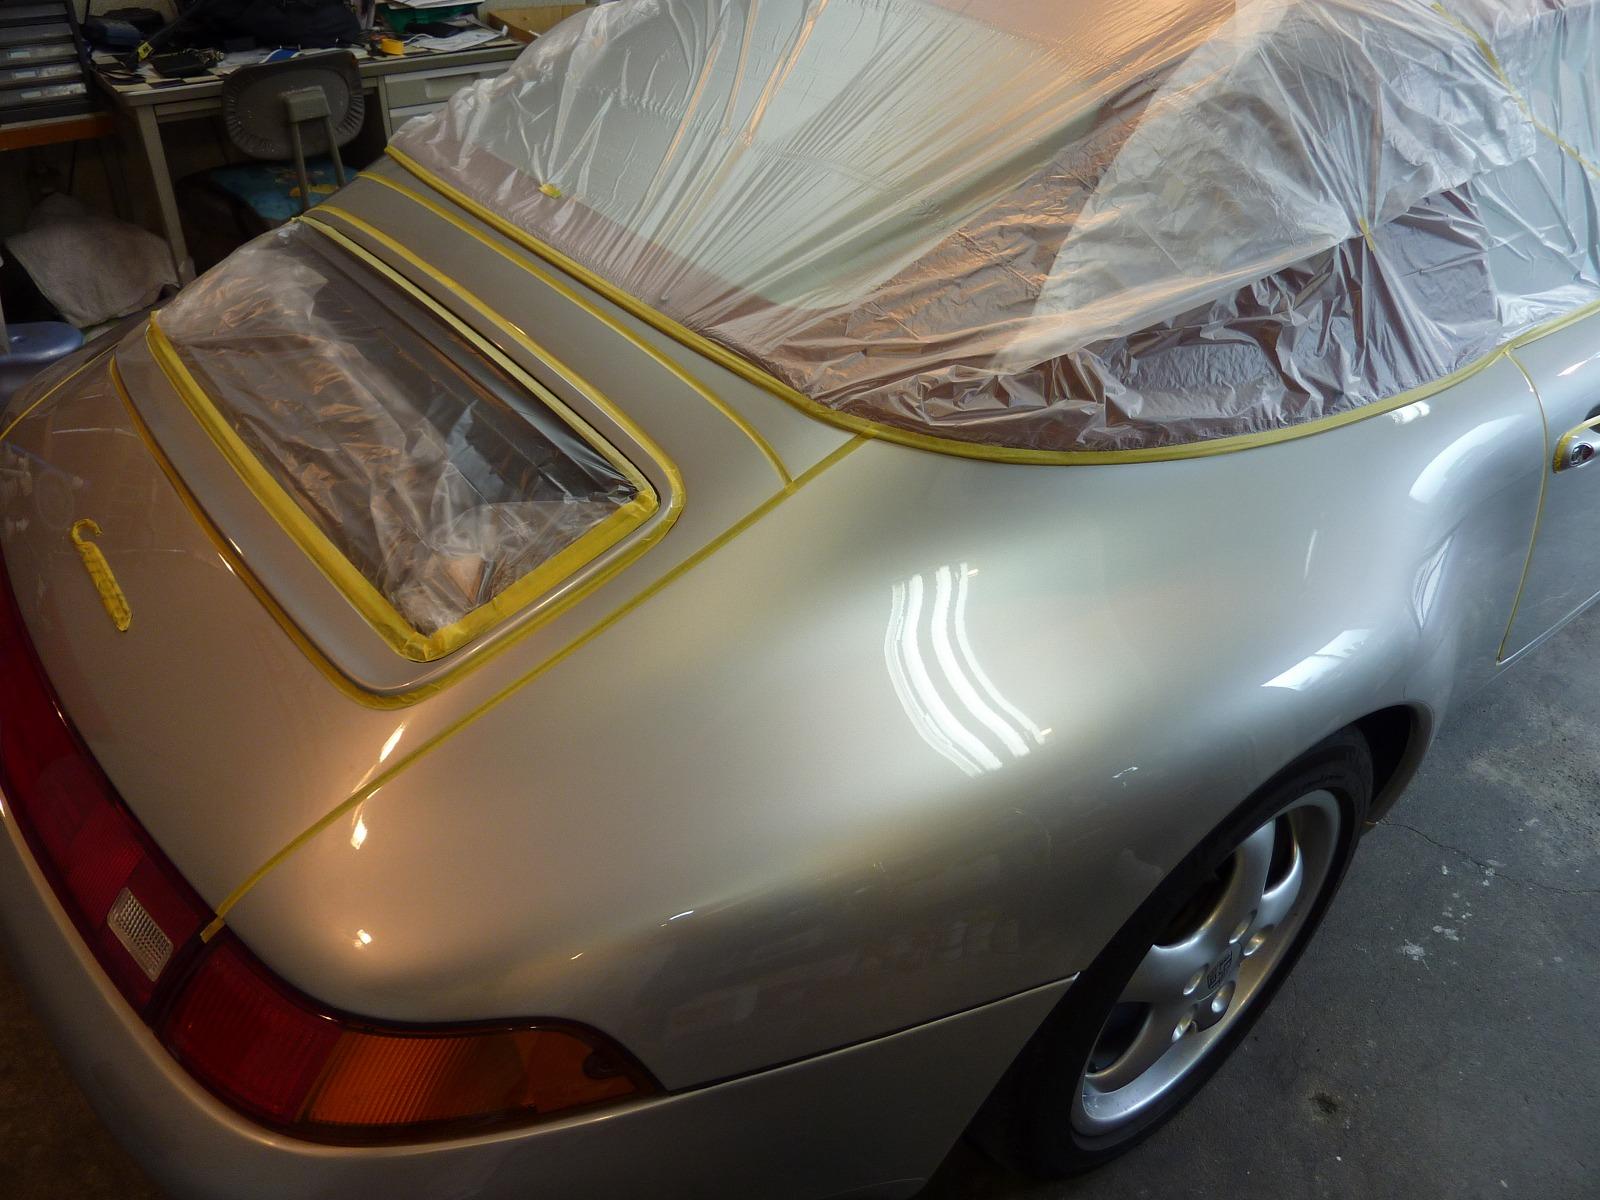 20140822-porsche-911-carrera-cabriolet-04